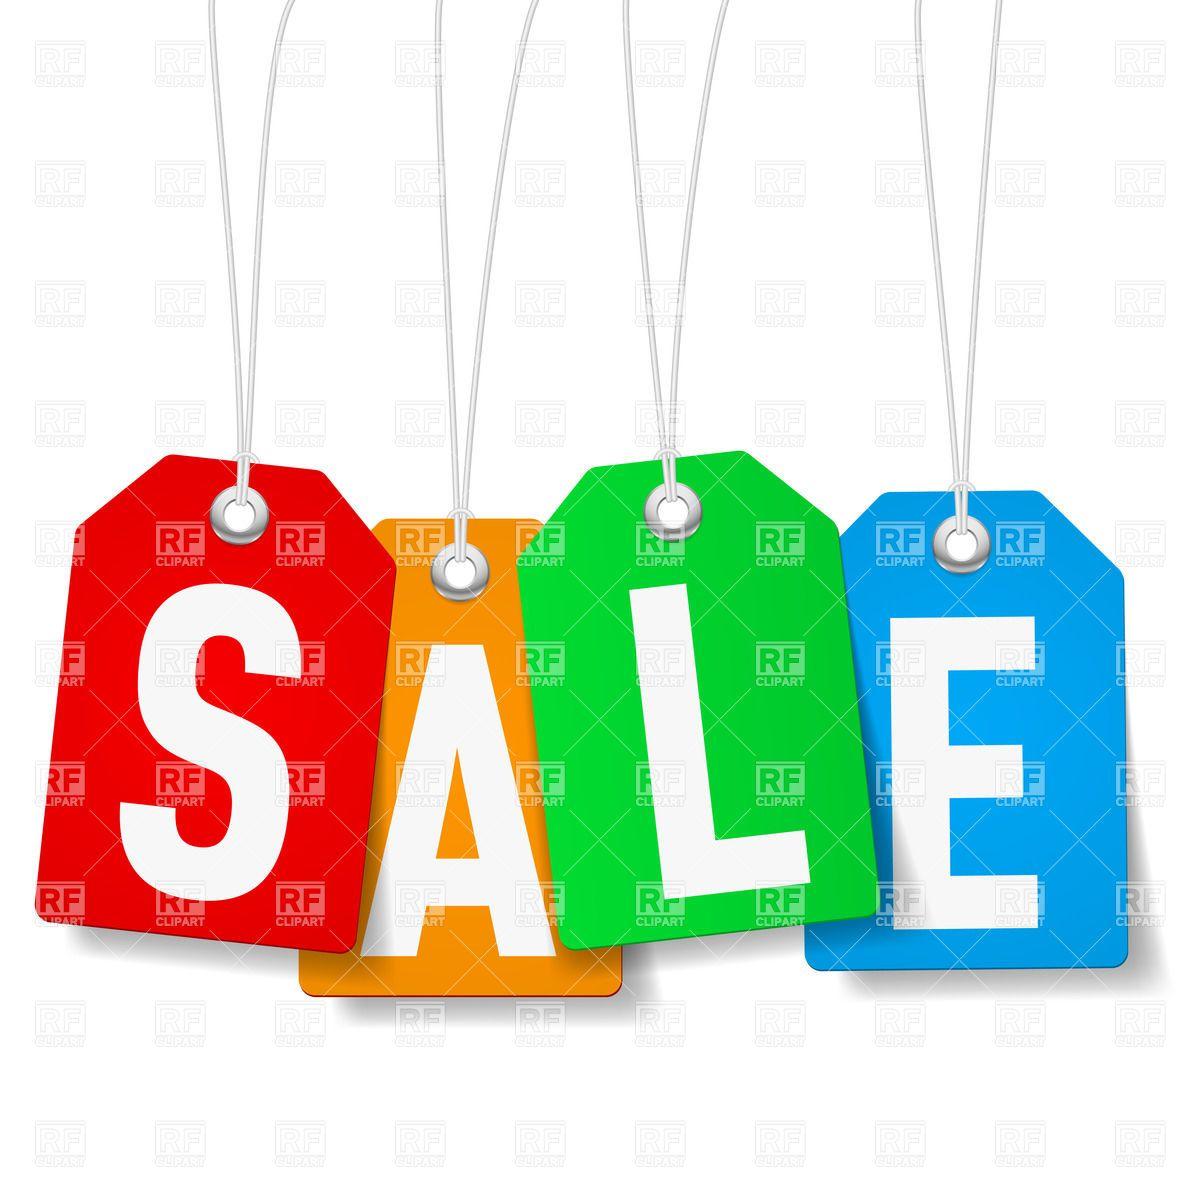 estate sale yard sale clip art yahoo image search results [ 1200 x 1200 Pixel ]